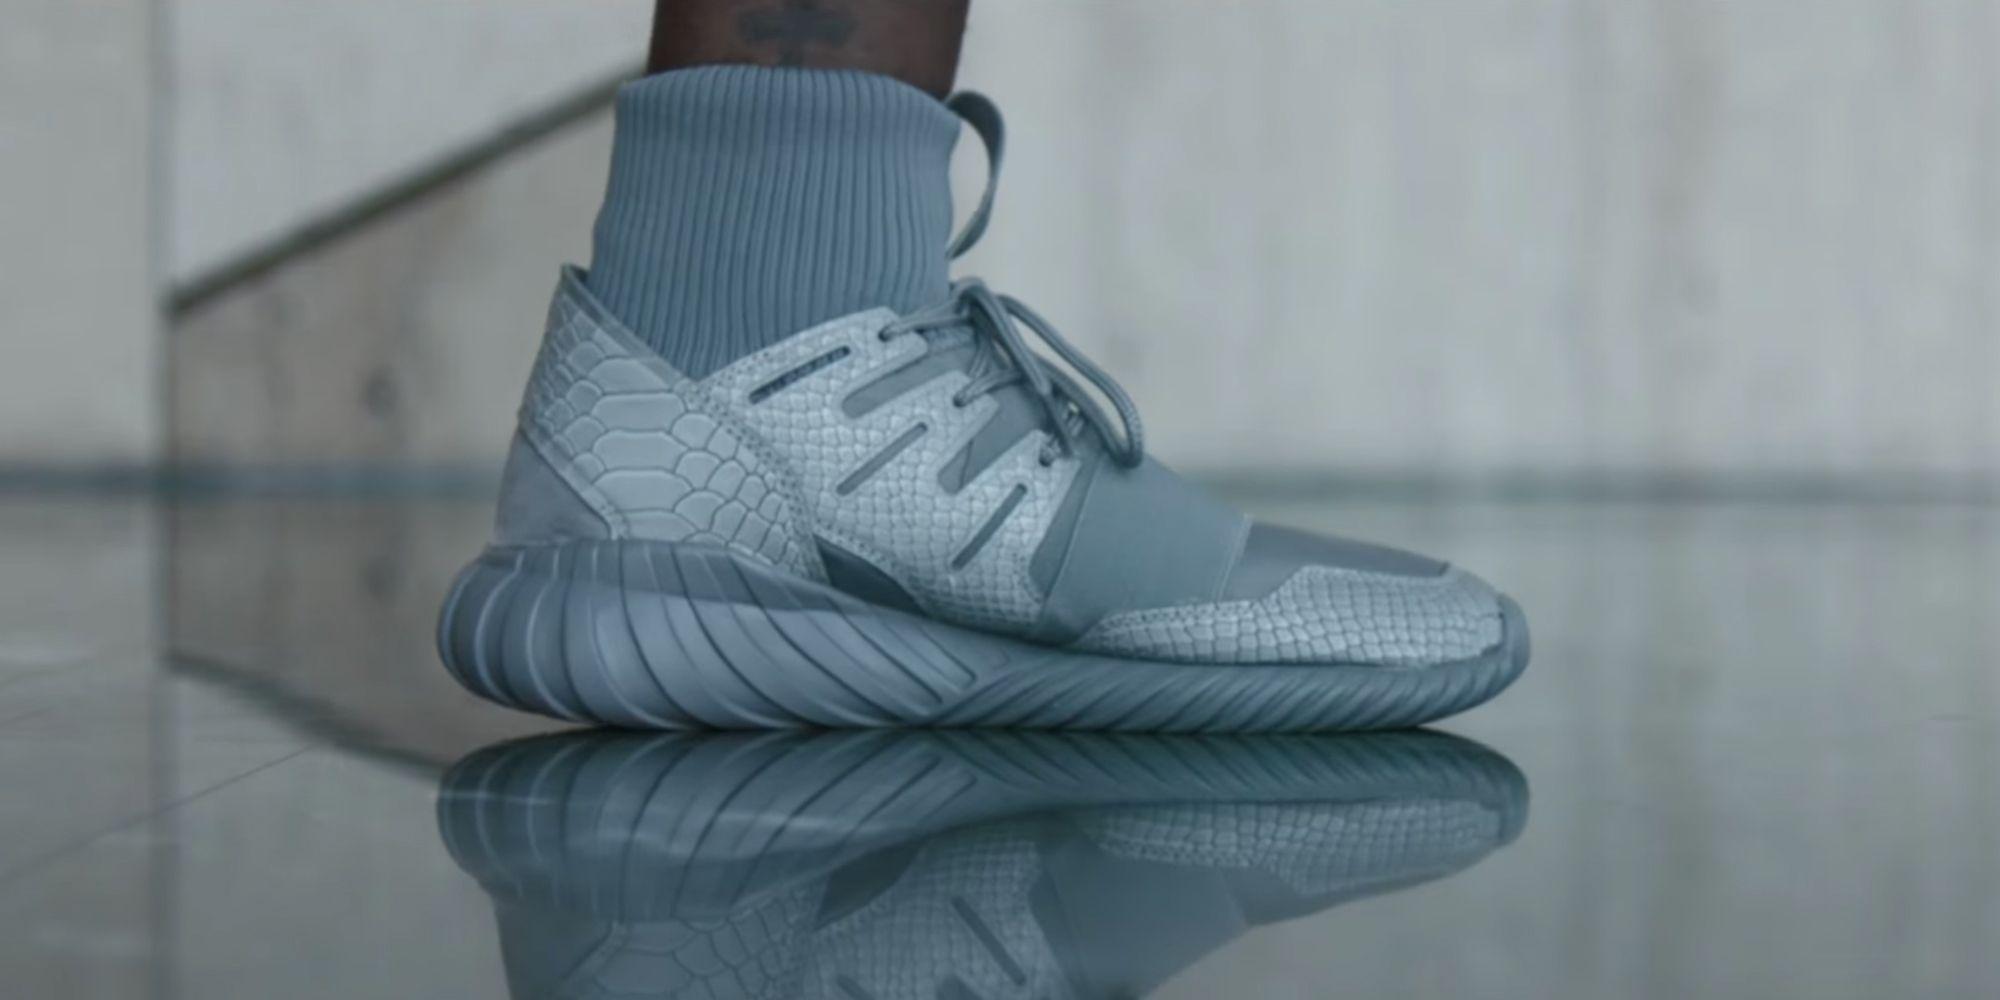 Adidas Its Continues Its Adidas Push for Futuristic Footwear Dominance 48dbf3